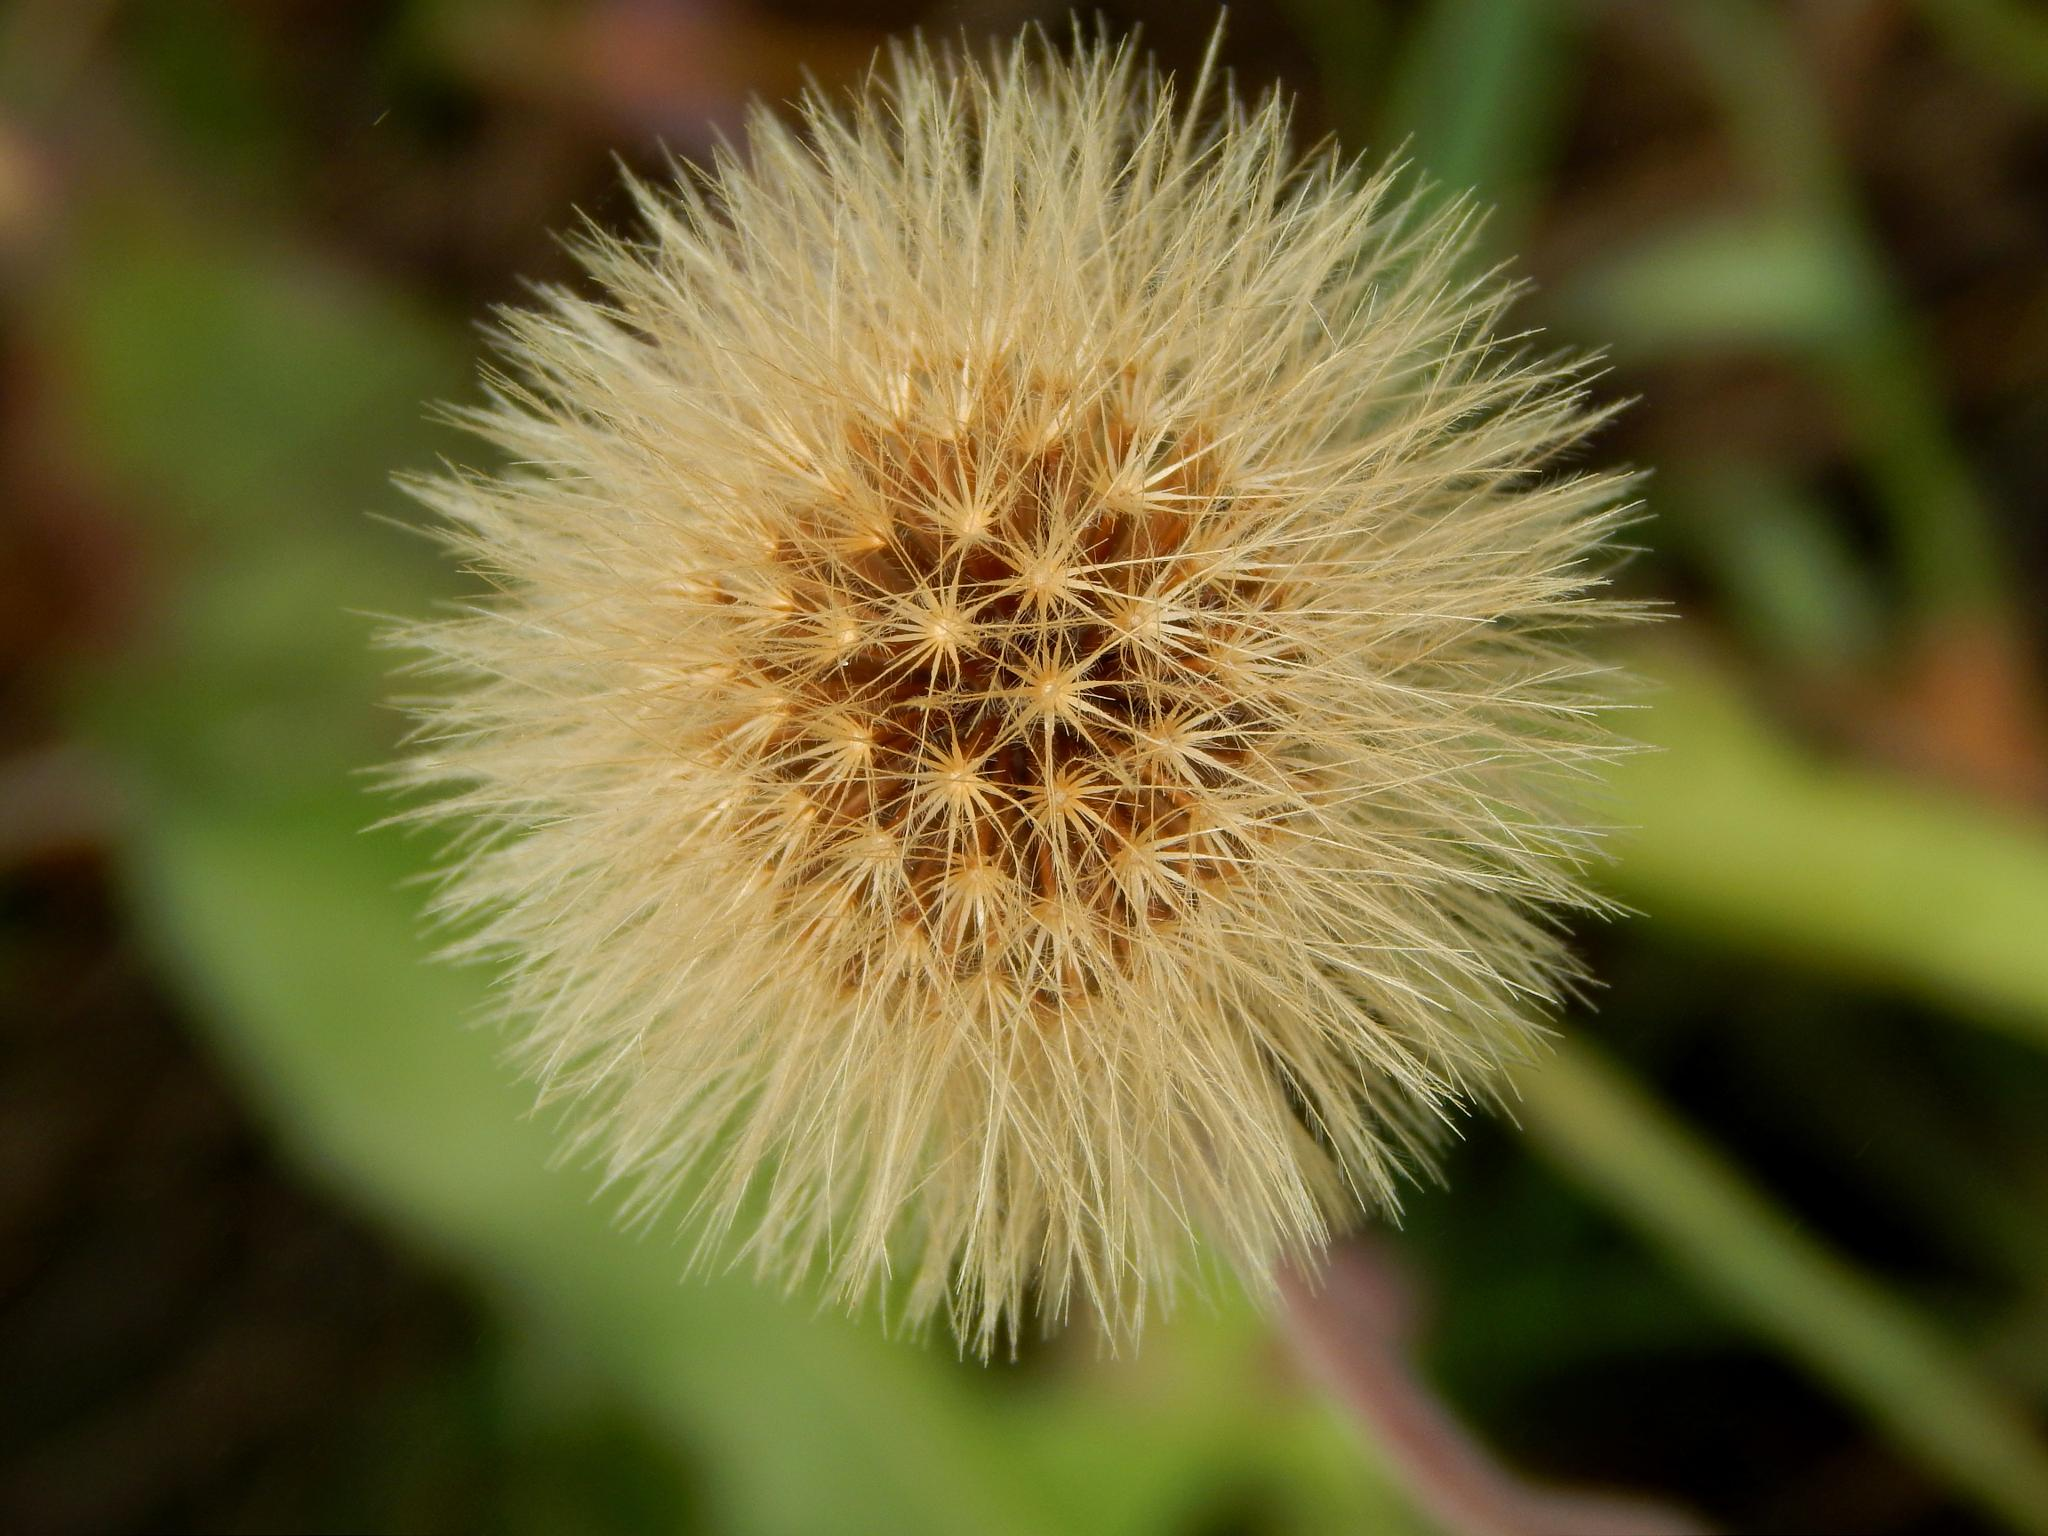 Puff ... Flower :-)  by robertamastretta